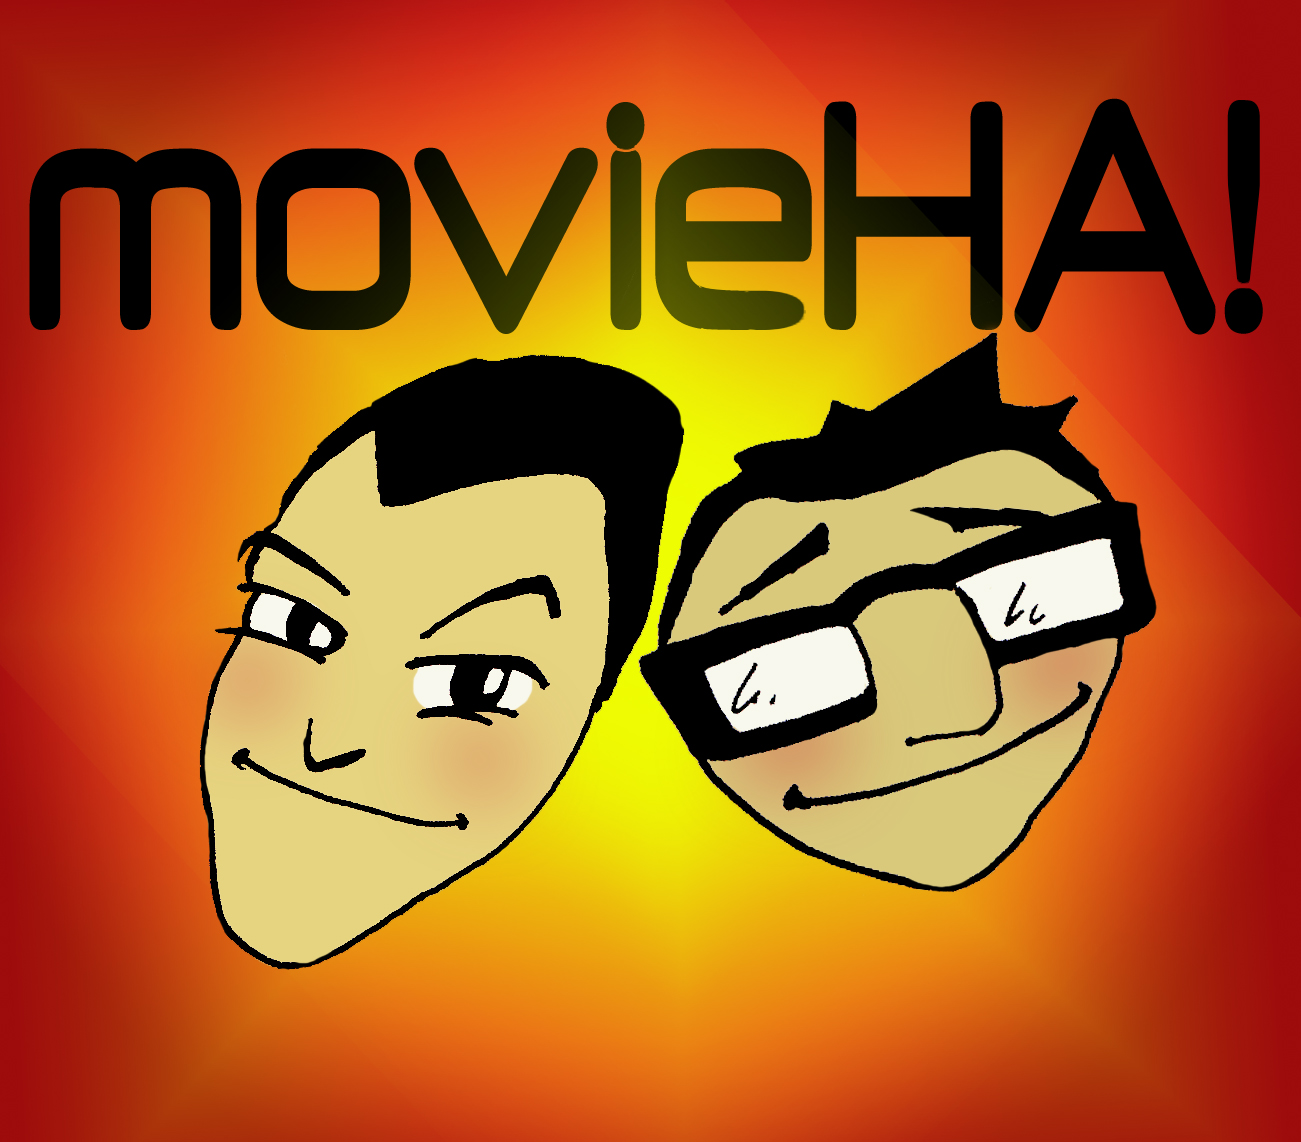 Movieha!